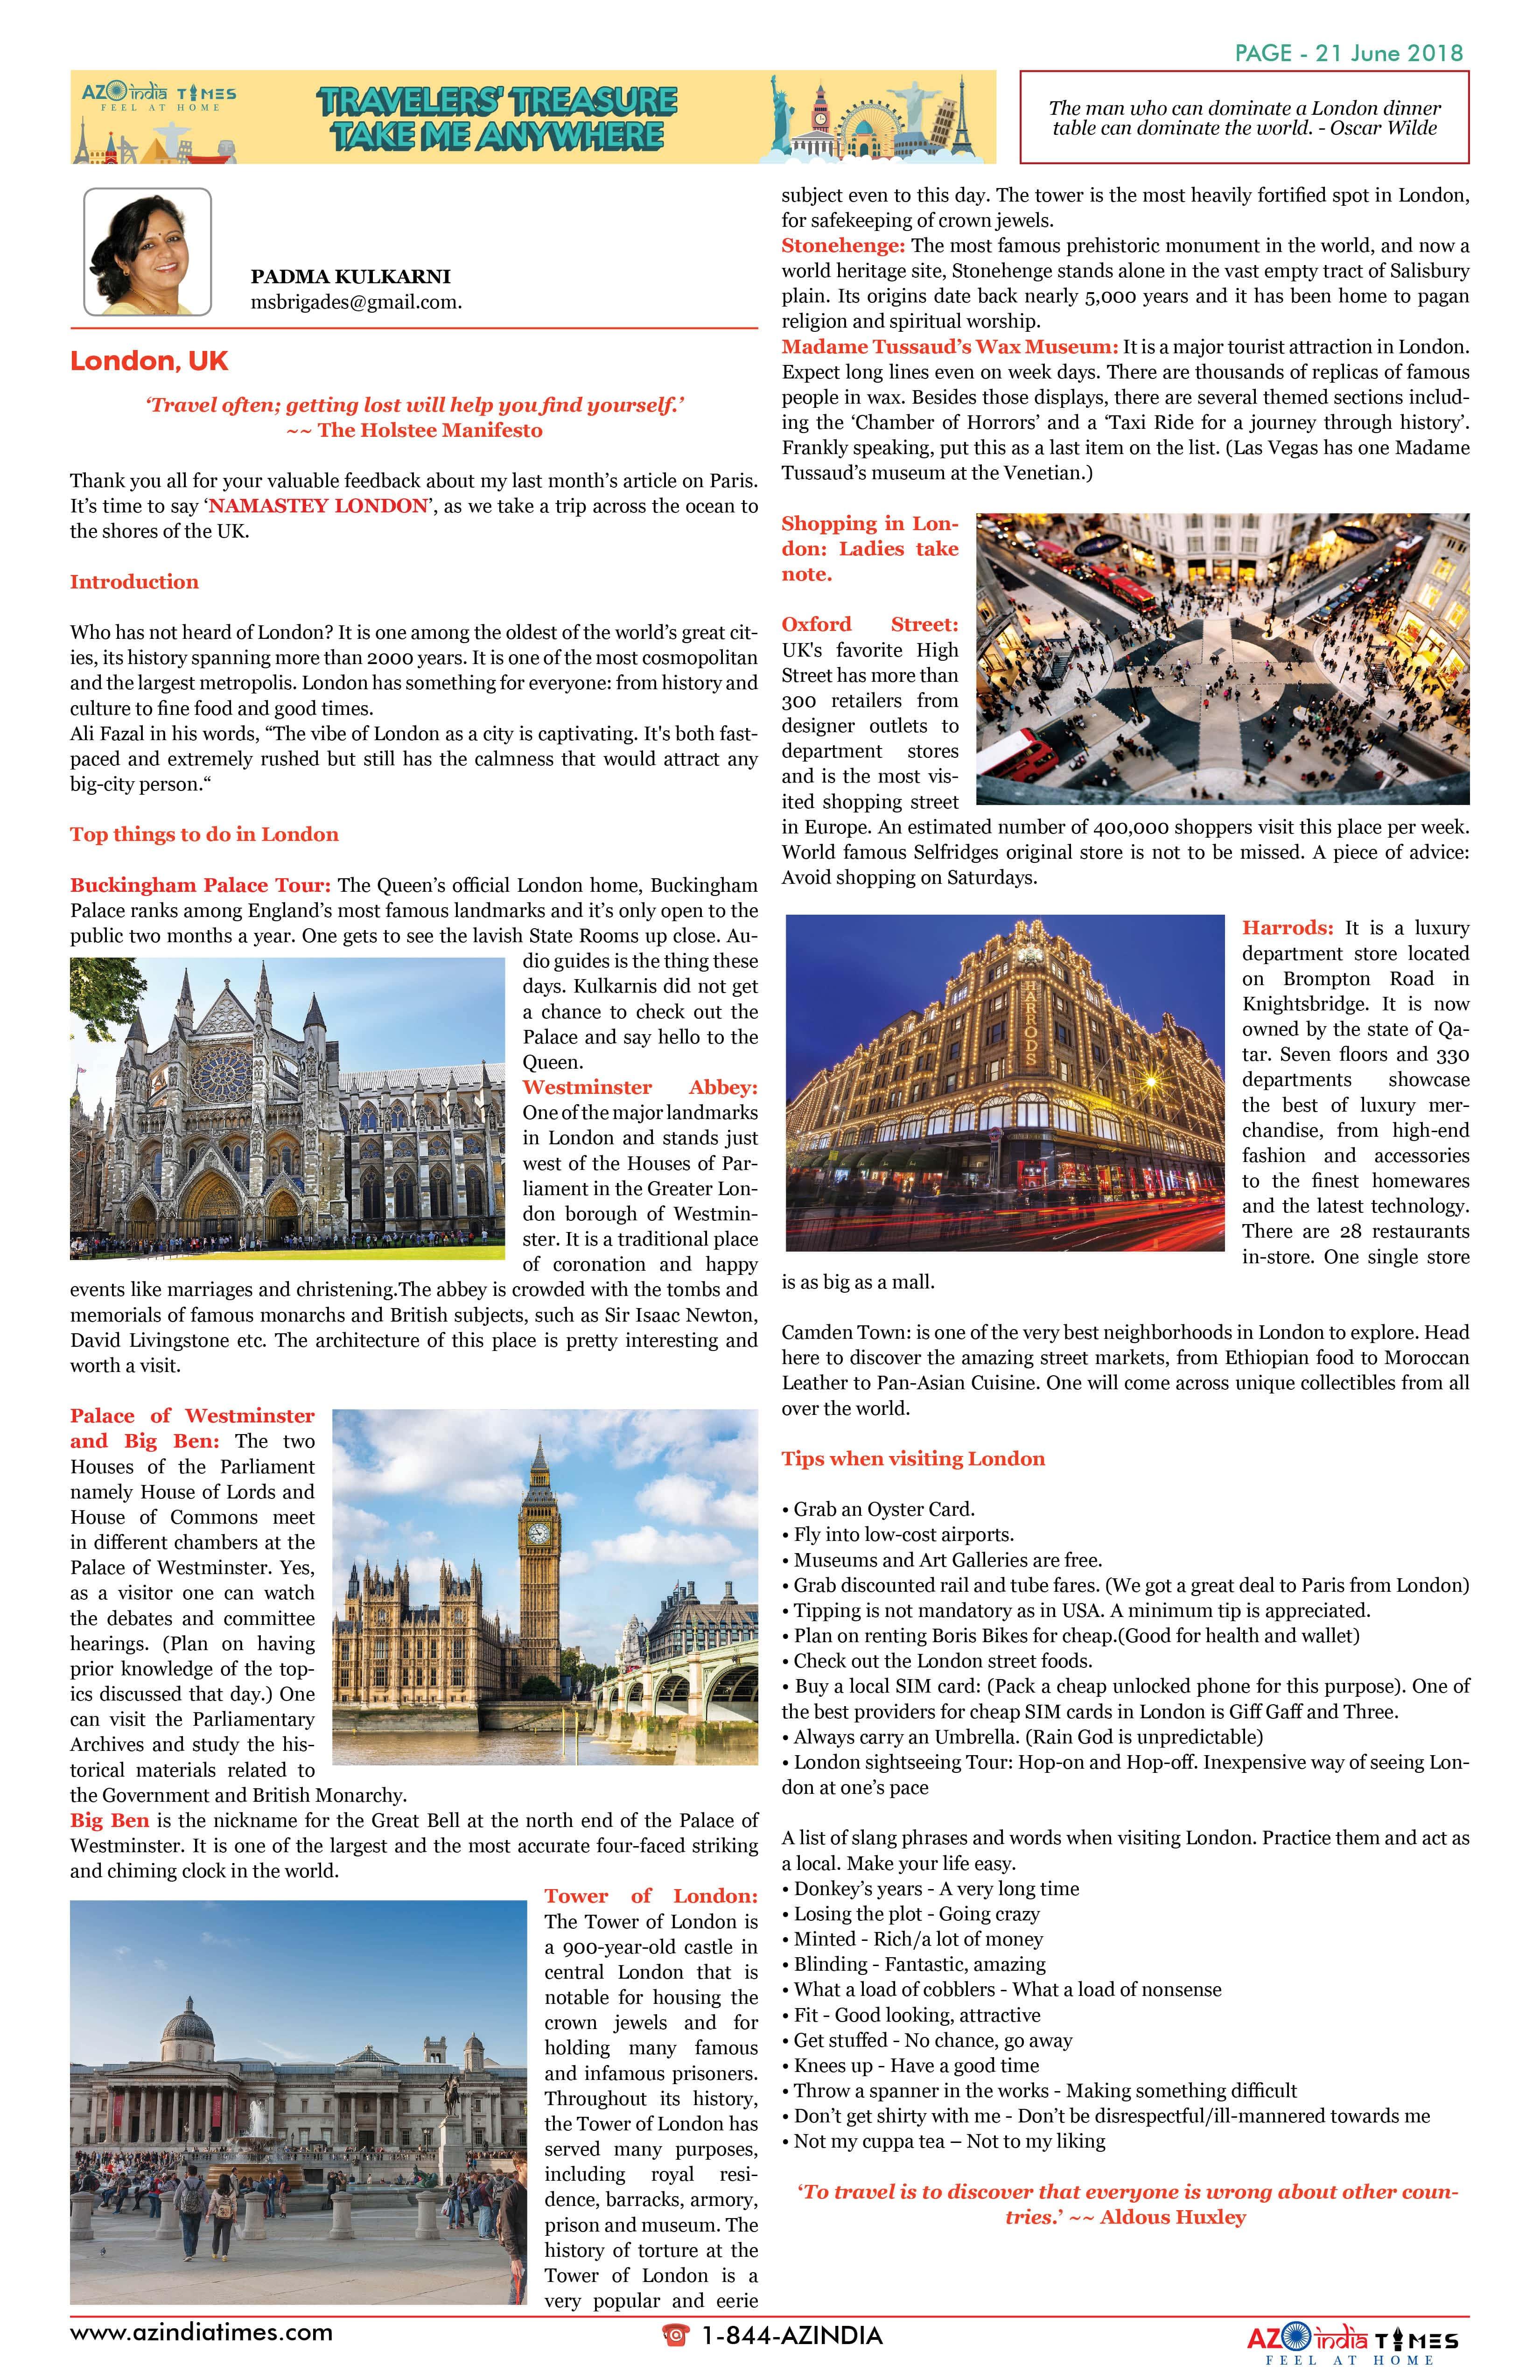 AZ INDIA JUNE EDITION 21